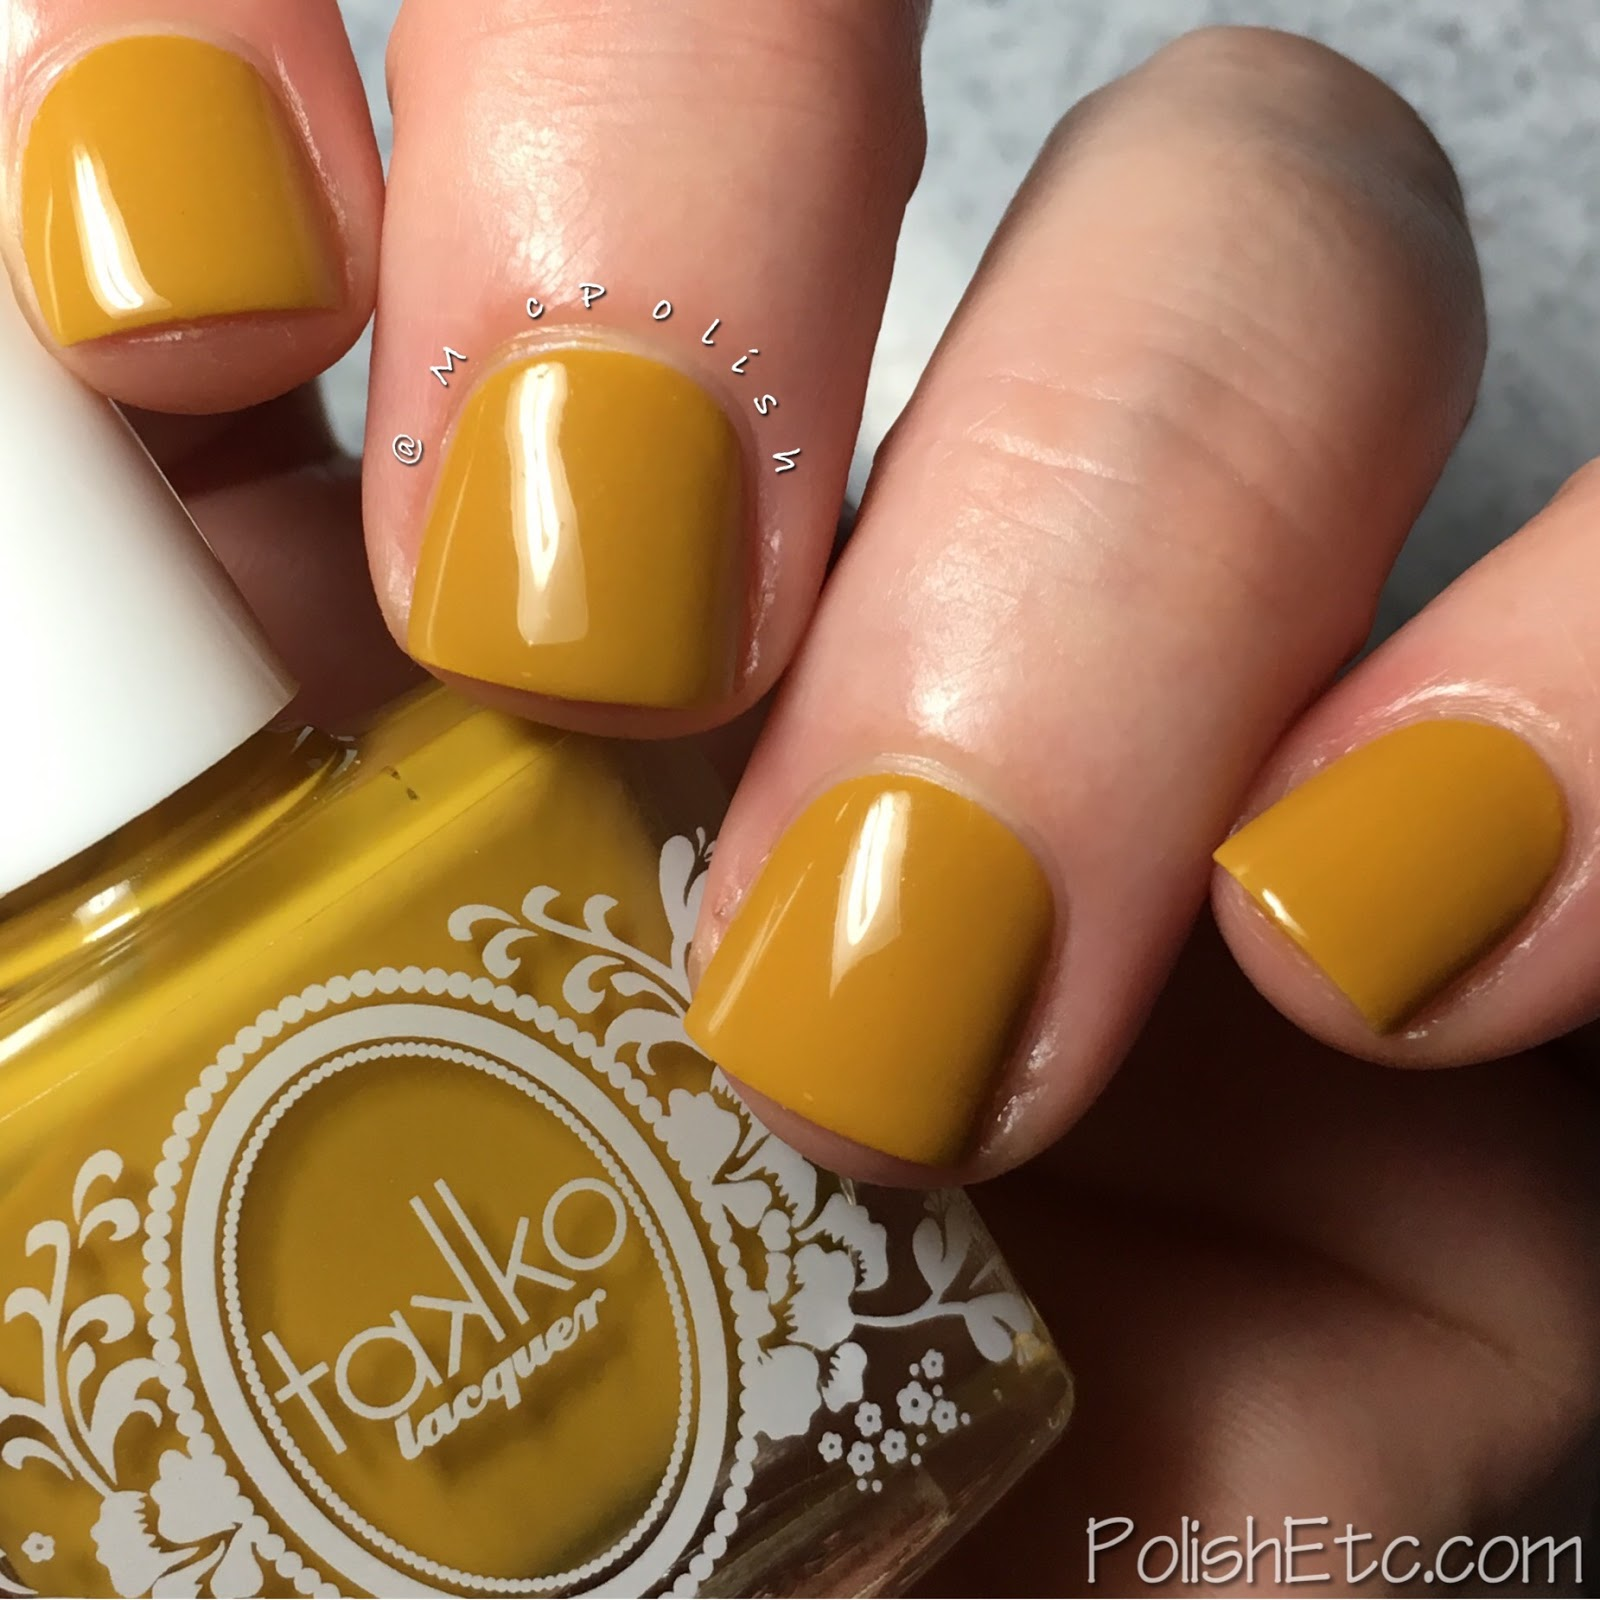 Takko Lacquer - Marigold - McPolish